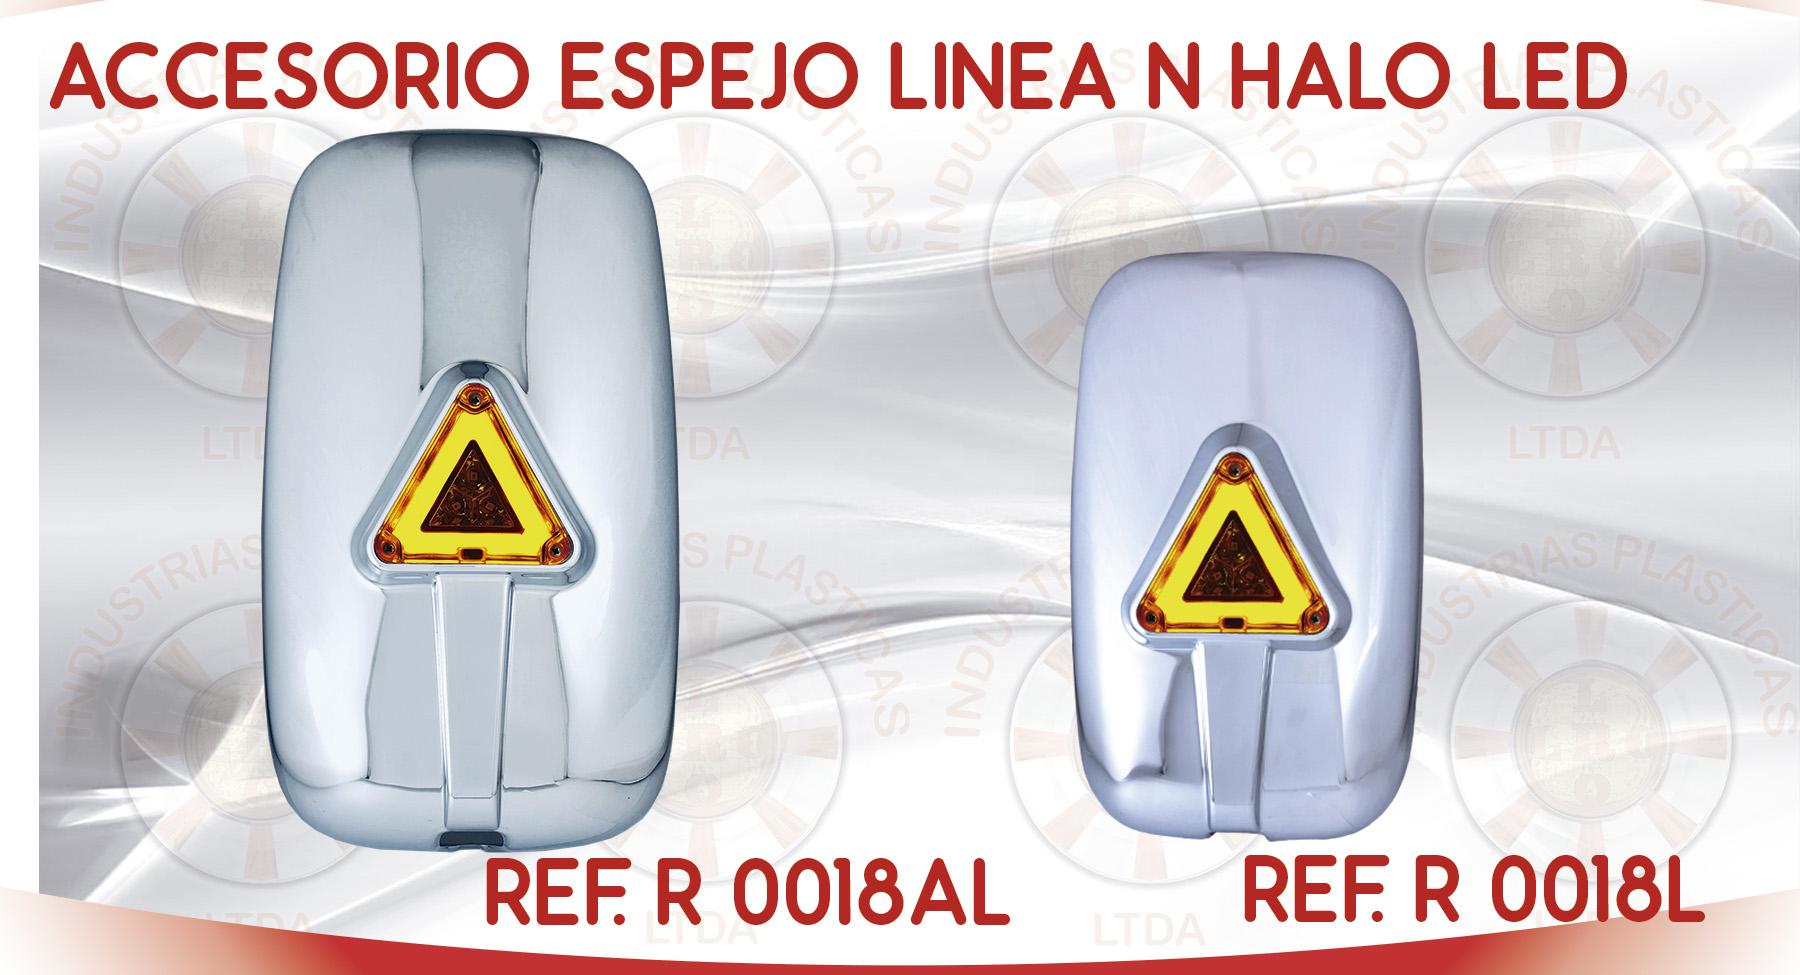 R 0018L ACCESORIO ESPEJO LINEA N HALO LED